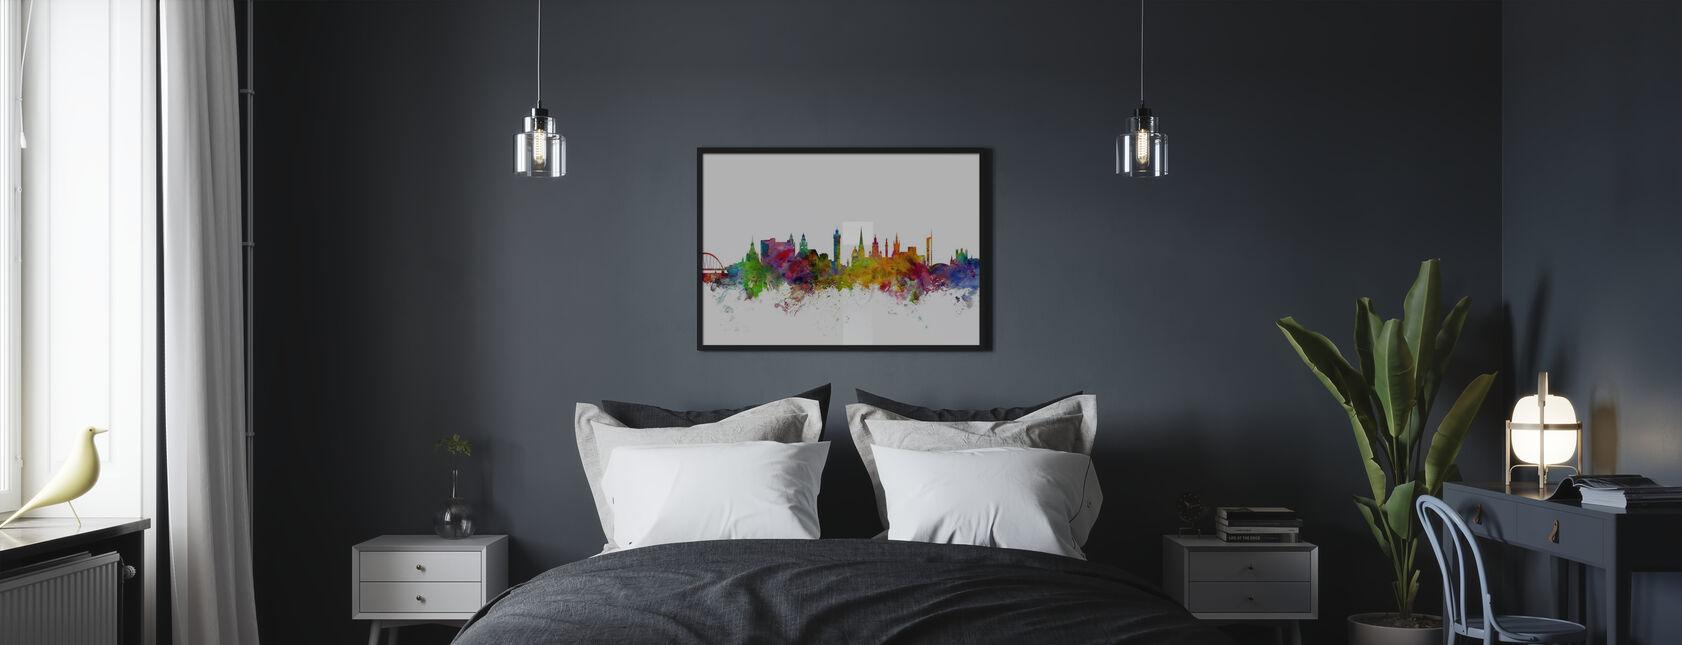 Glasgow Scotland Skyline - Poster - Bedroom